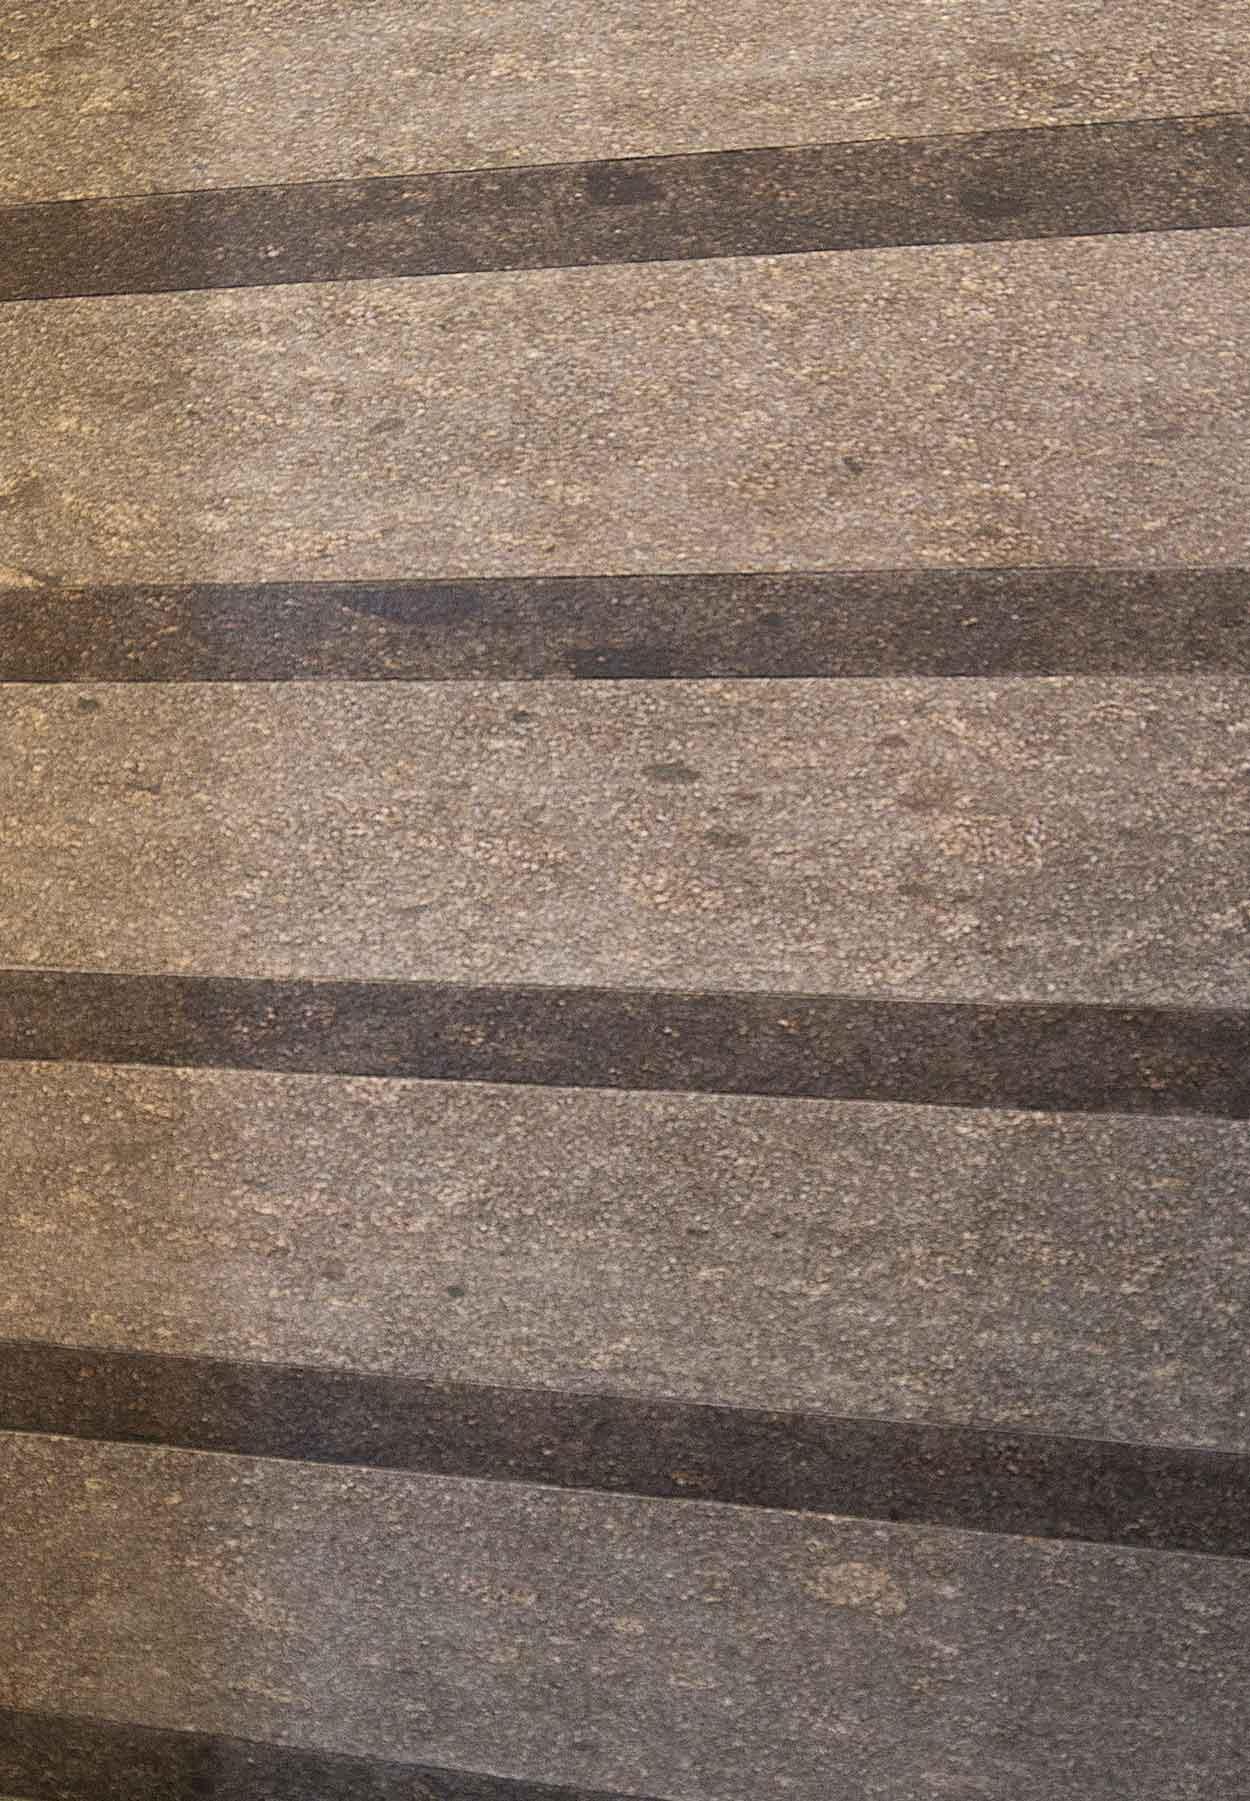 Naldi pavimenti, Materiali, Pietra, Porfido